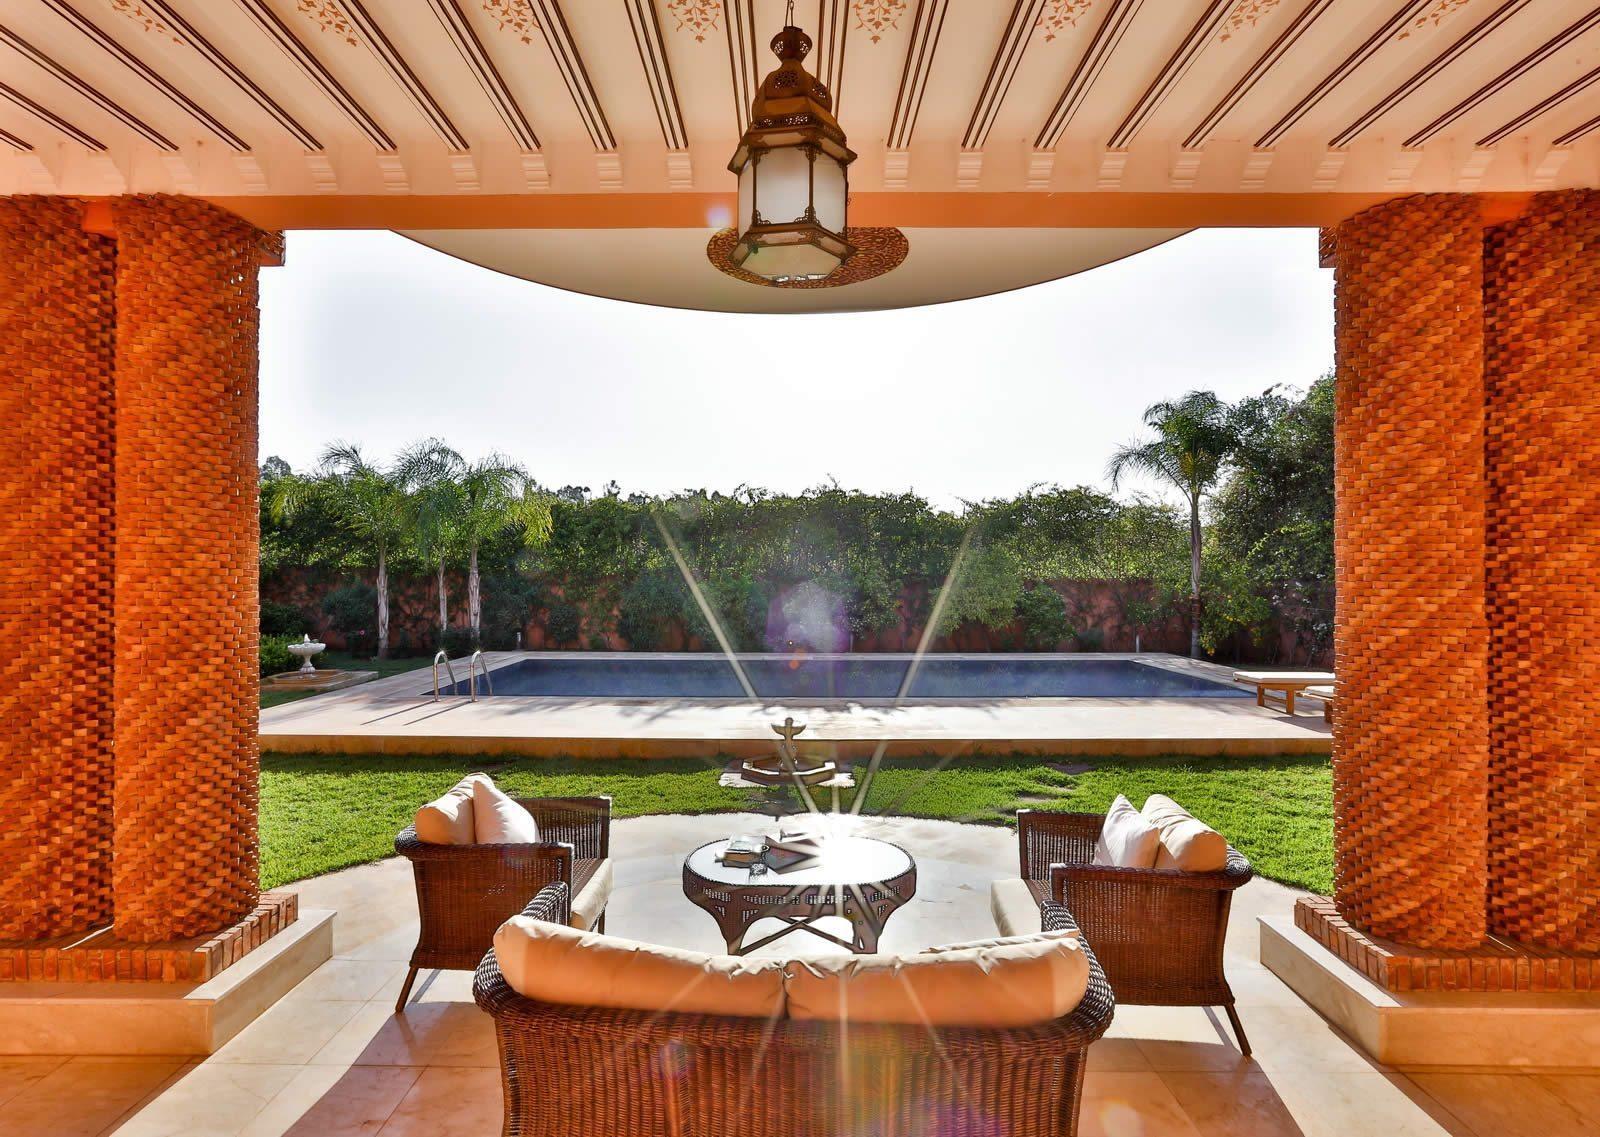 villa-a-vendre-golf-amelkis-sauna-piscine-jacuzzi